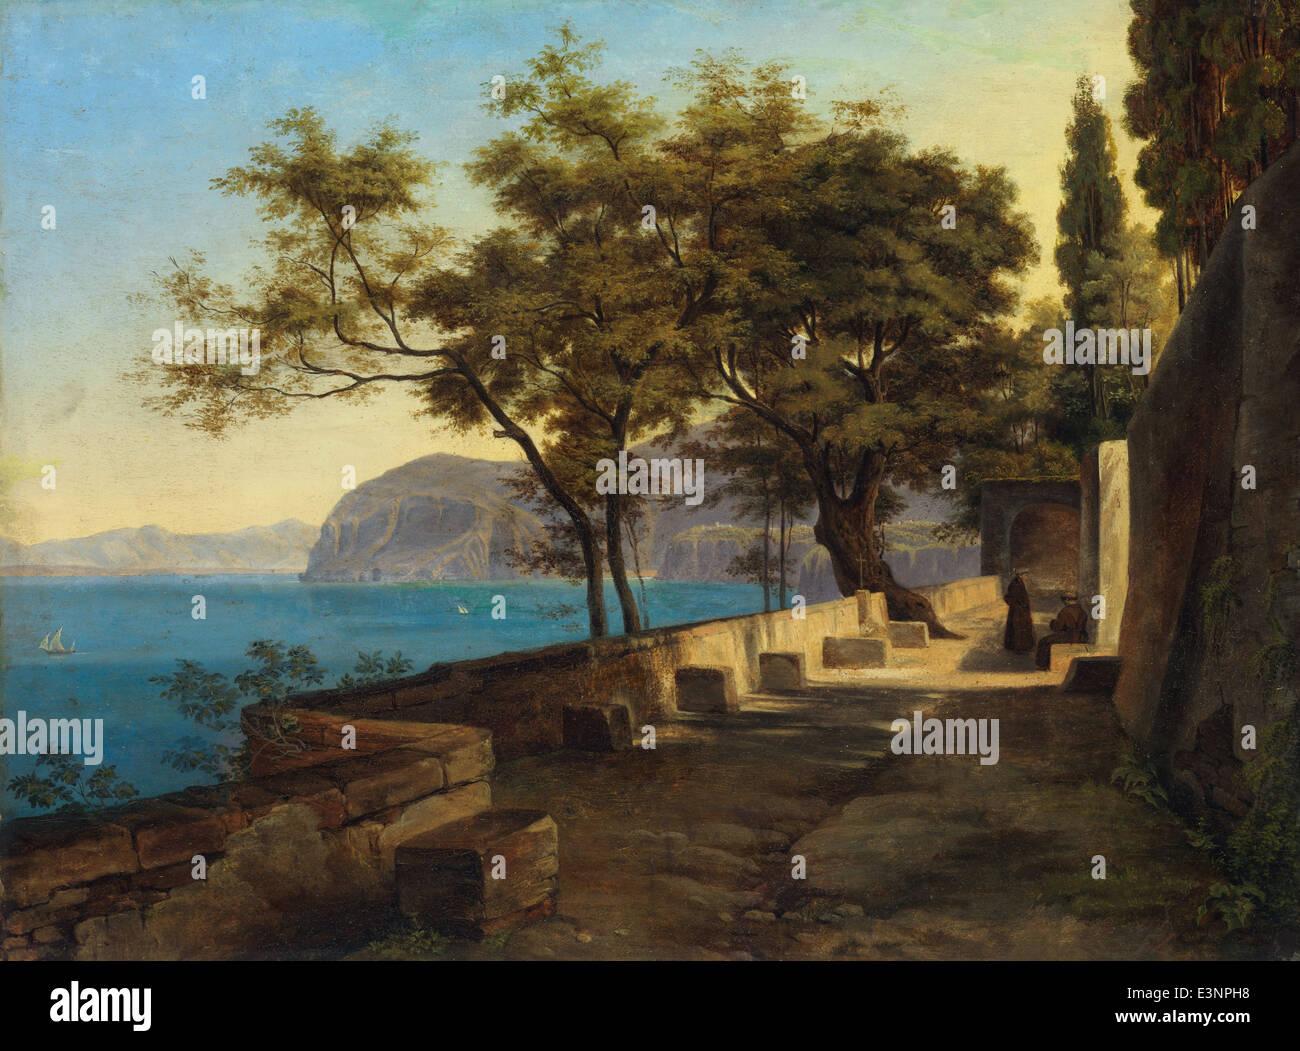 Heinrich Reinhold - Terrace of the Capuchin Garden, Sorrento - 1824 - Stock Image